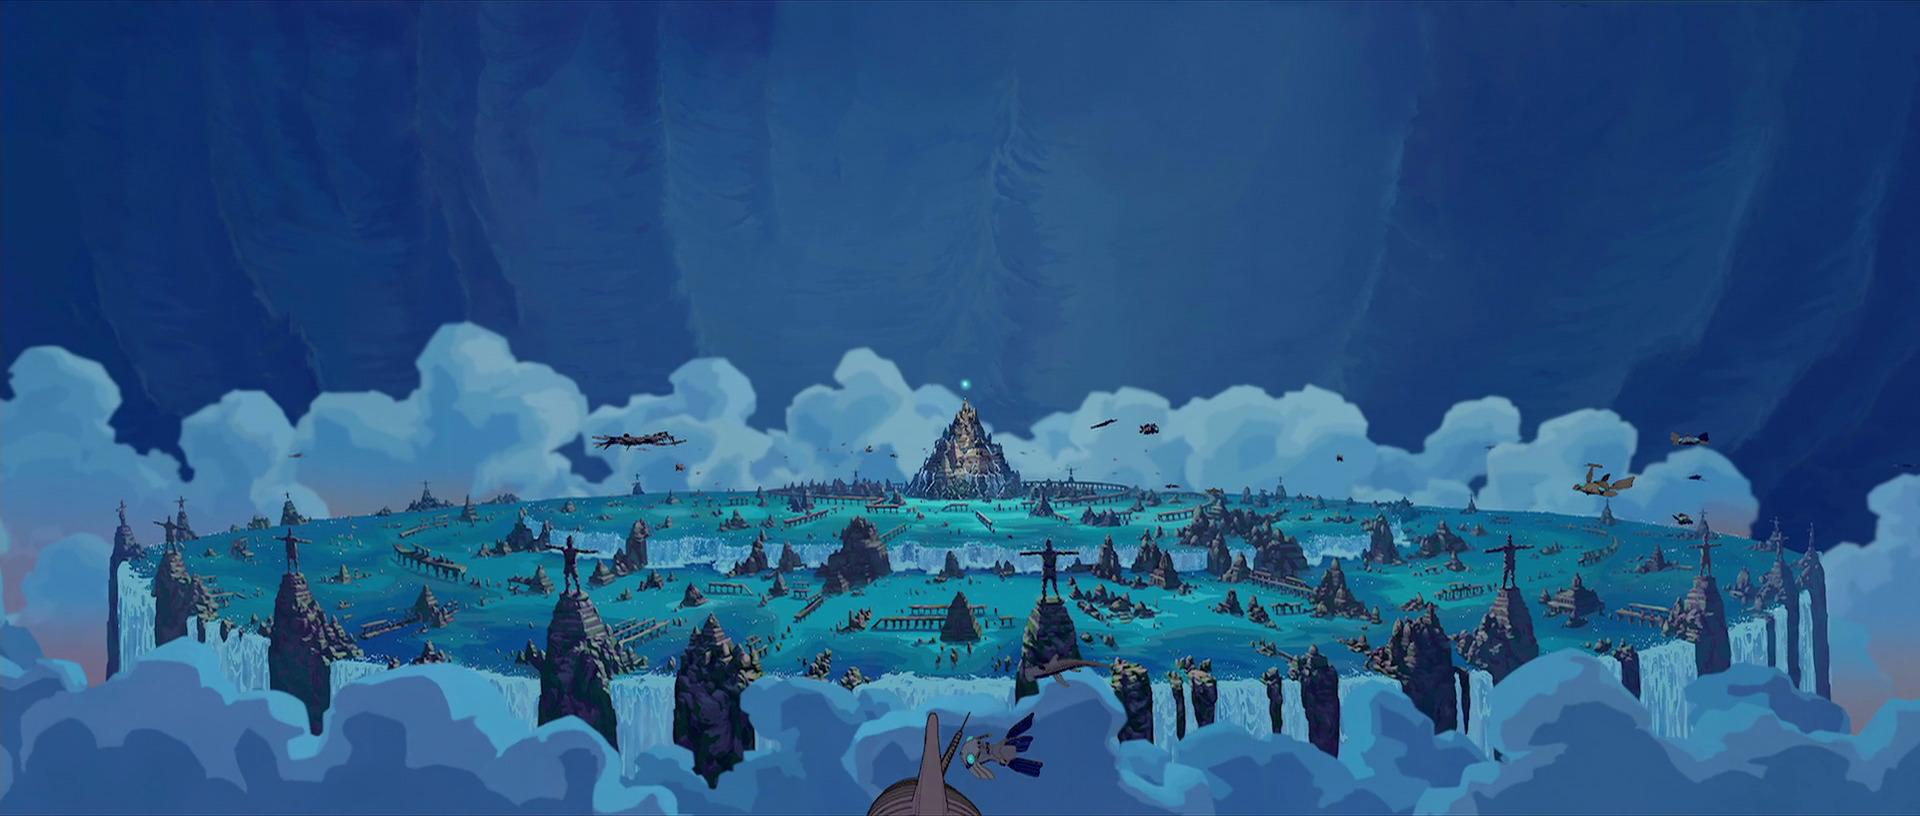 Atlantis u l impero perduto tra cartone animato e belle